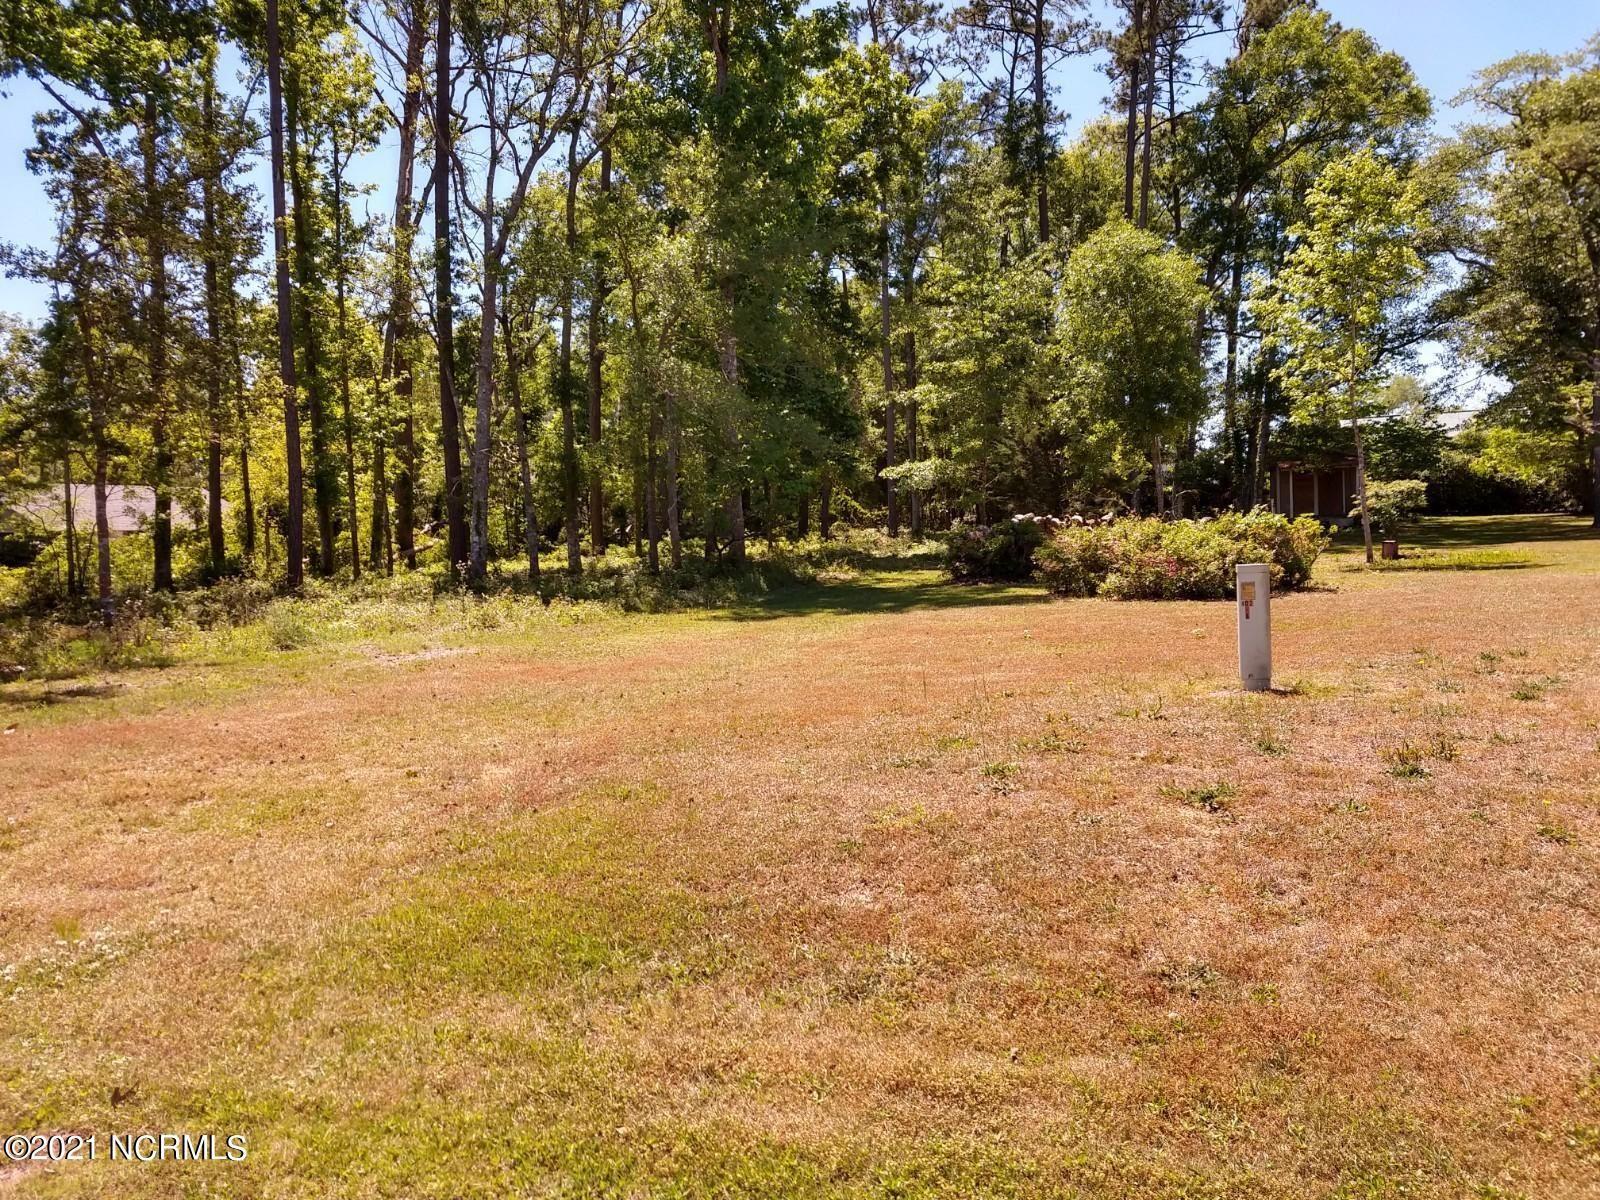 Photo of 114 Yaupon Drive, Cape Carteret, NC 28584 (MLS # 100272012)